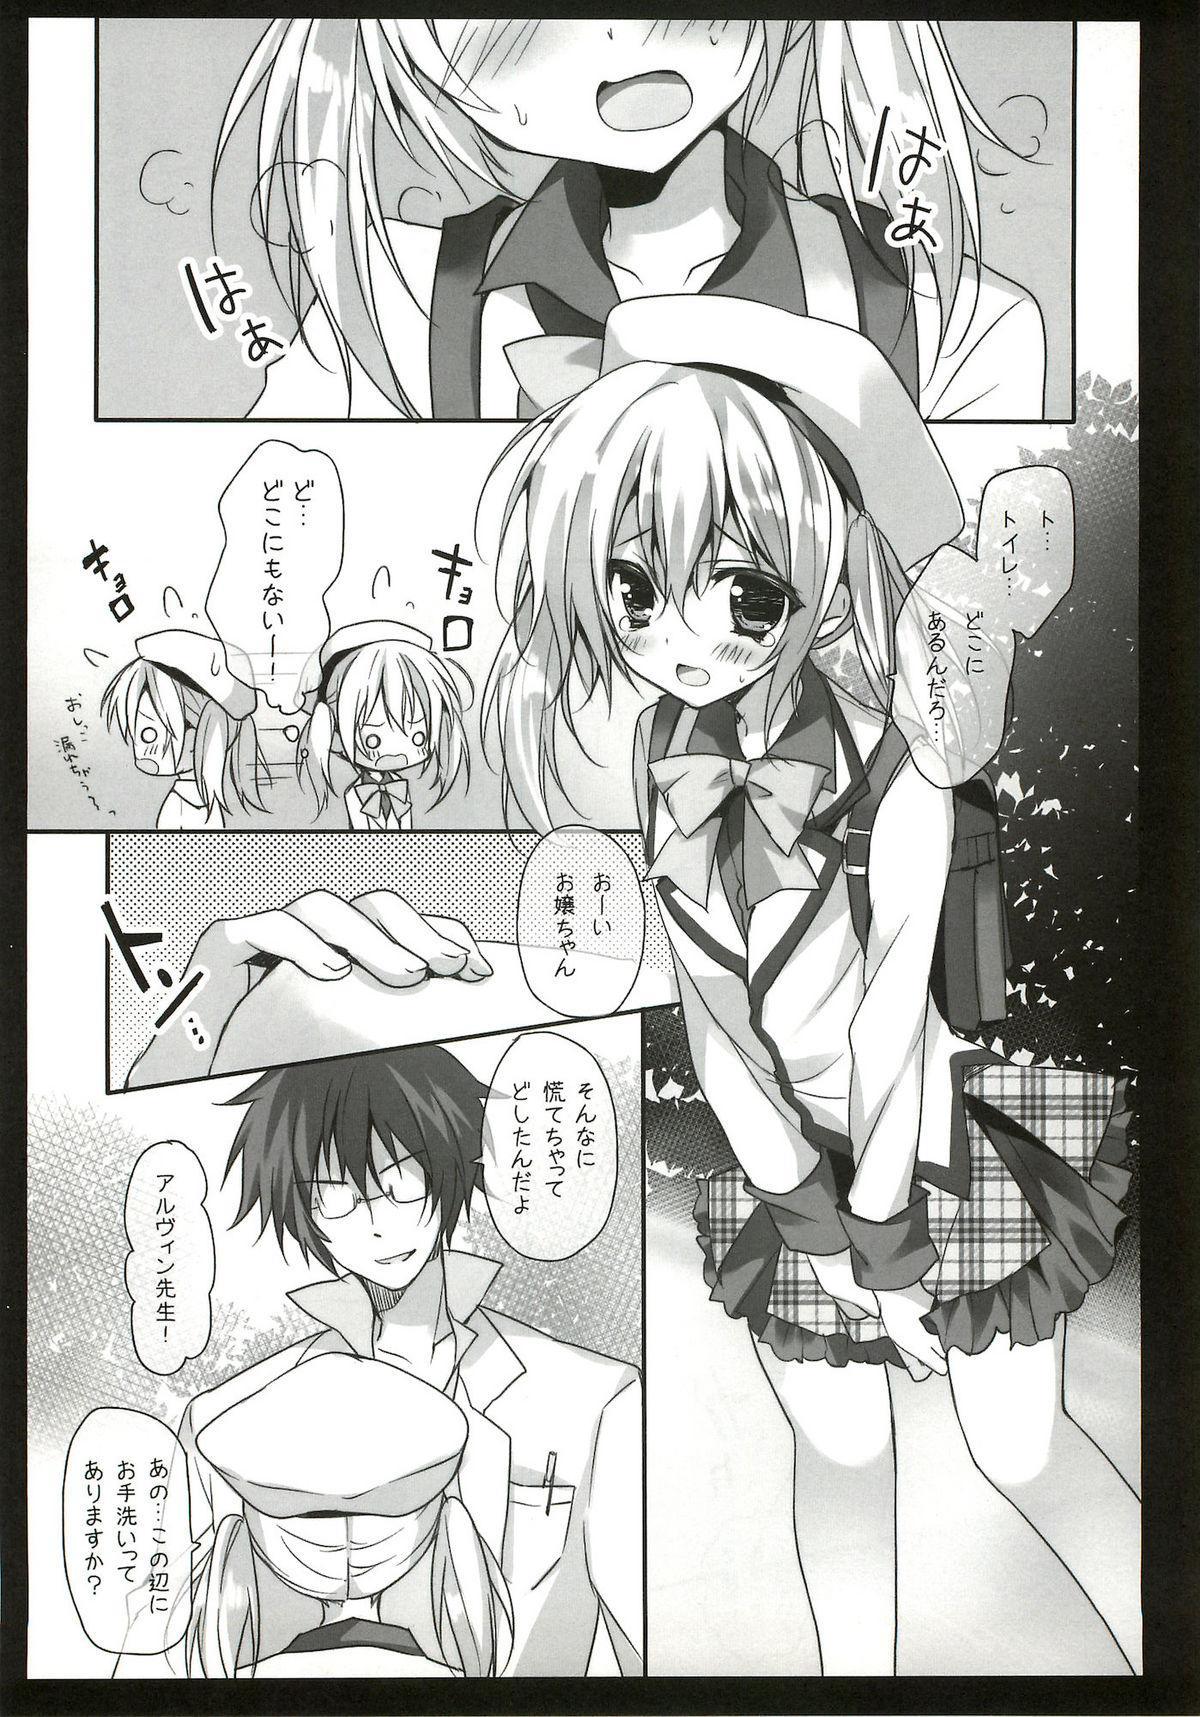 Elise-chan ga Itazura Sarechau Hon 3